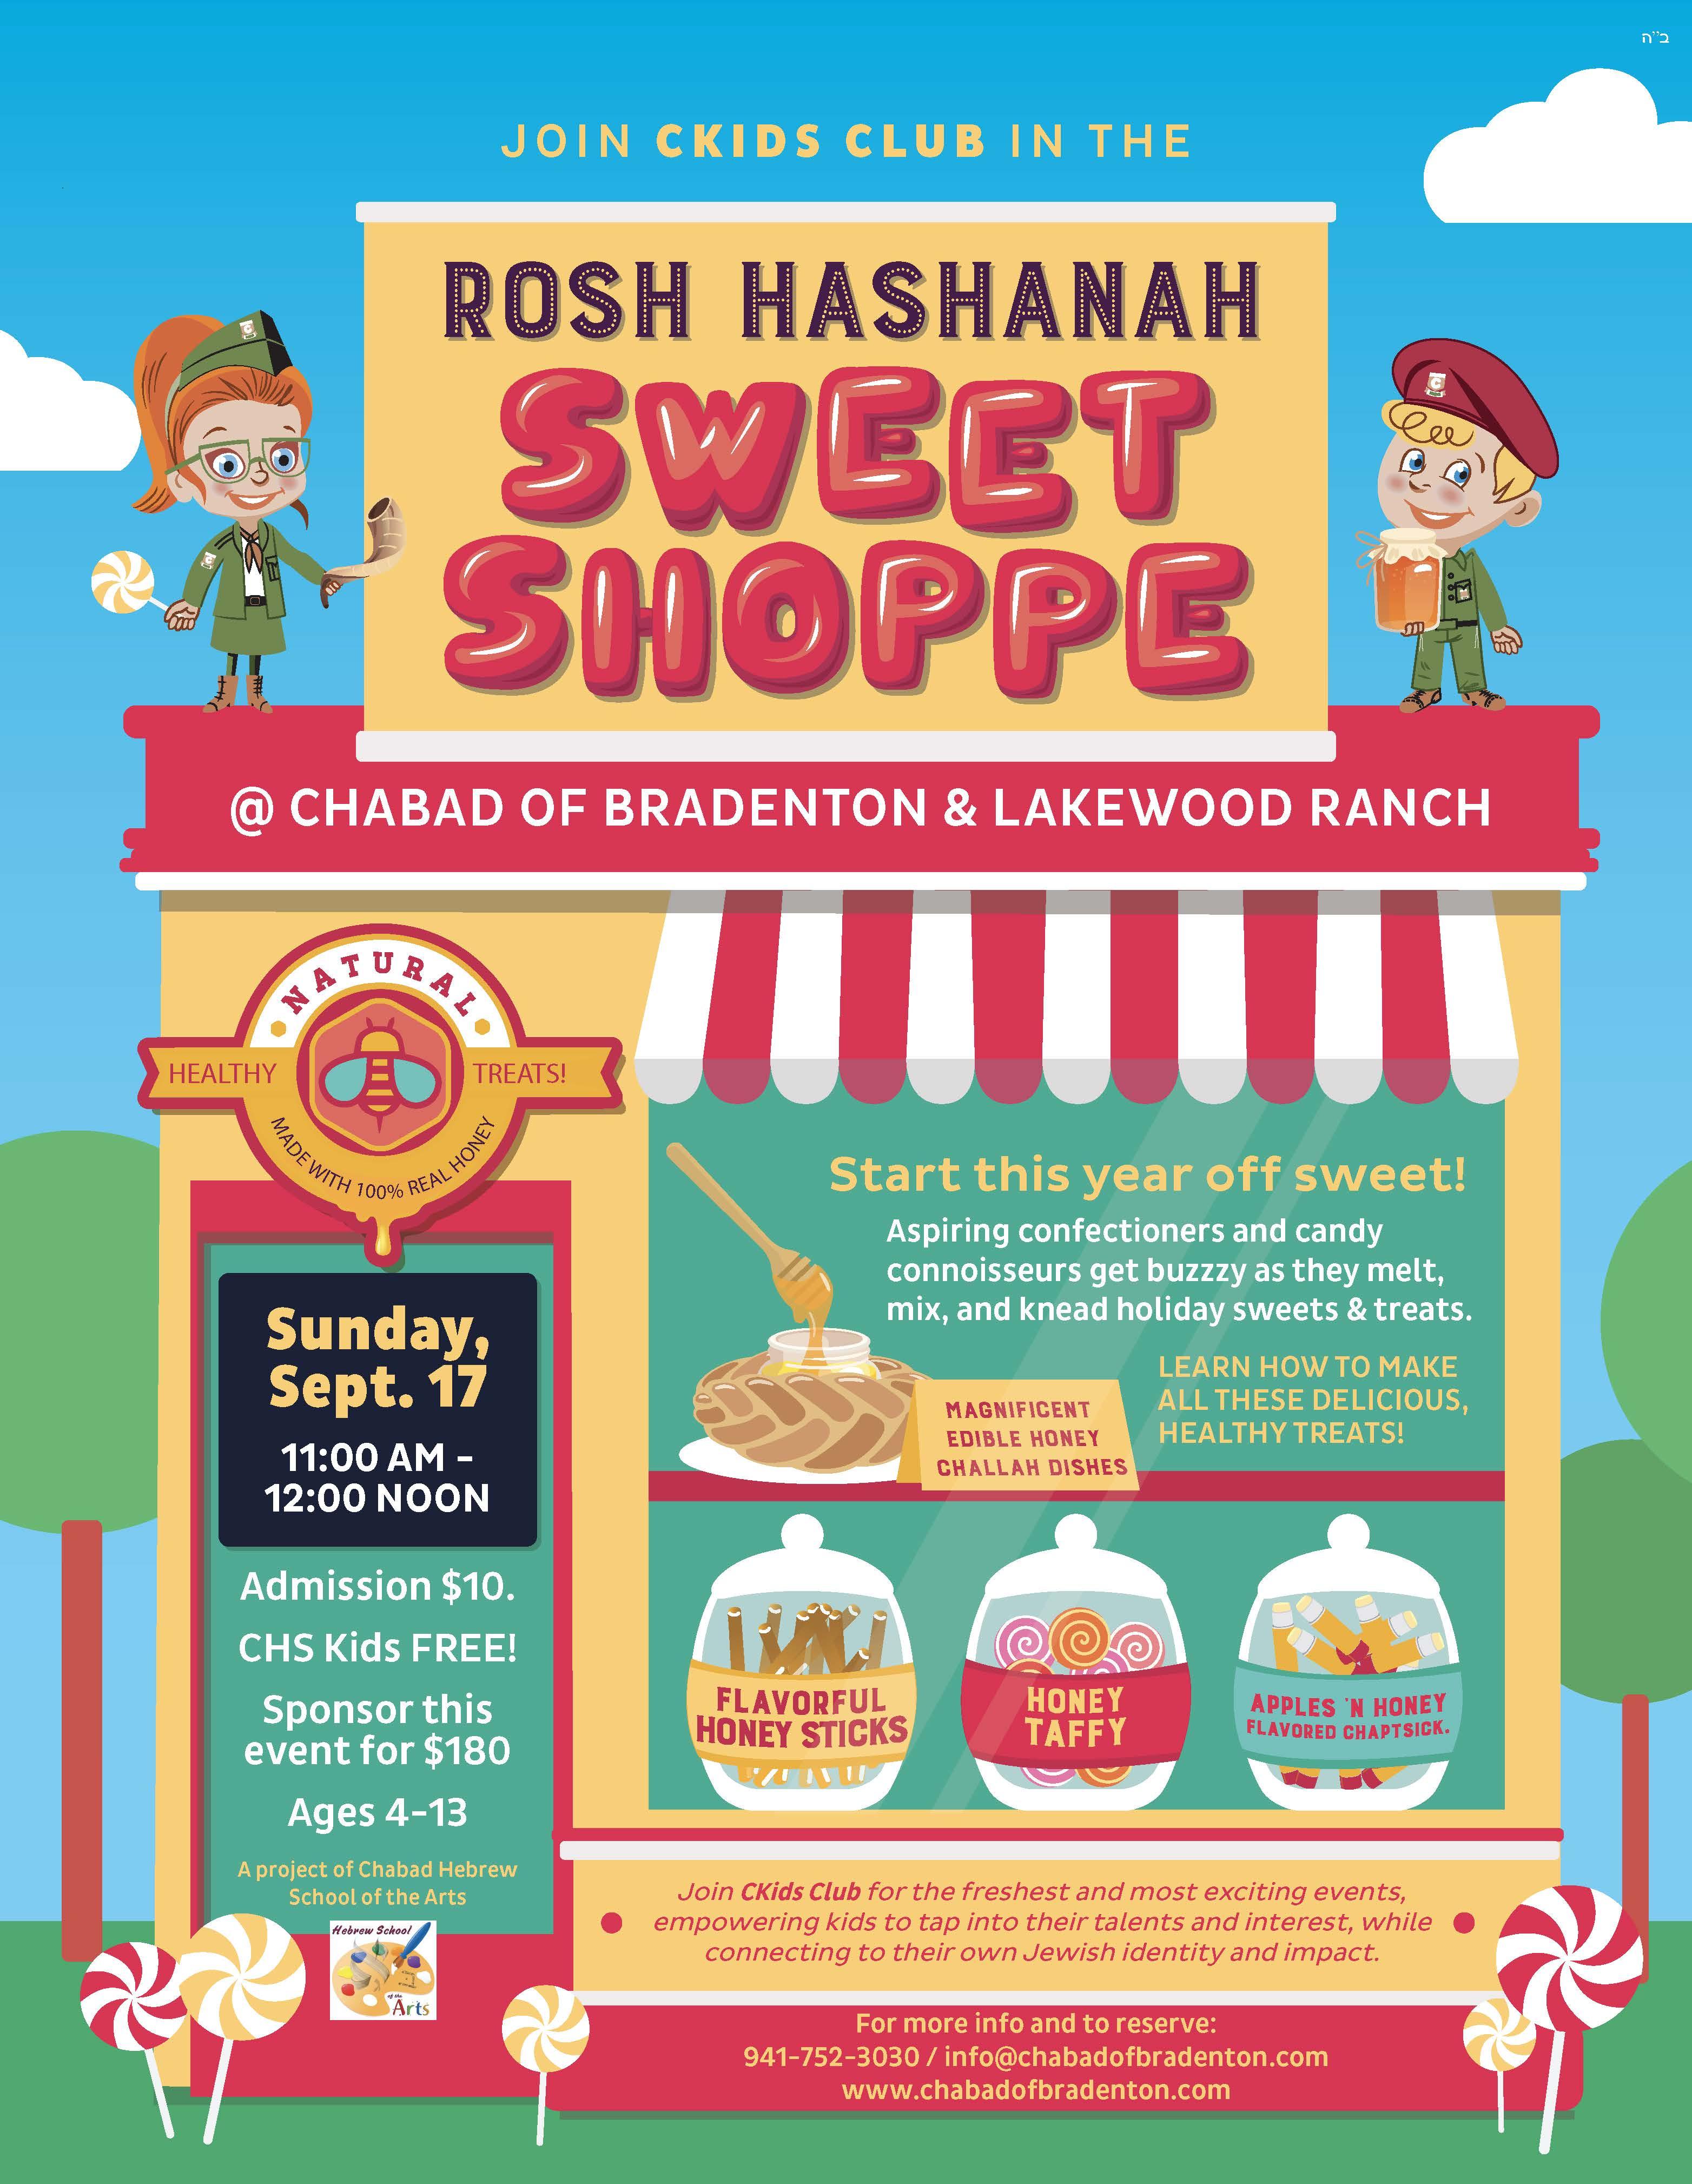 rosh hashana sweet shoppe FLYER.jpg